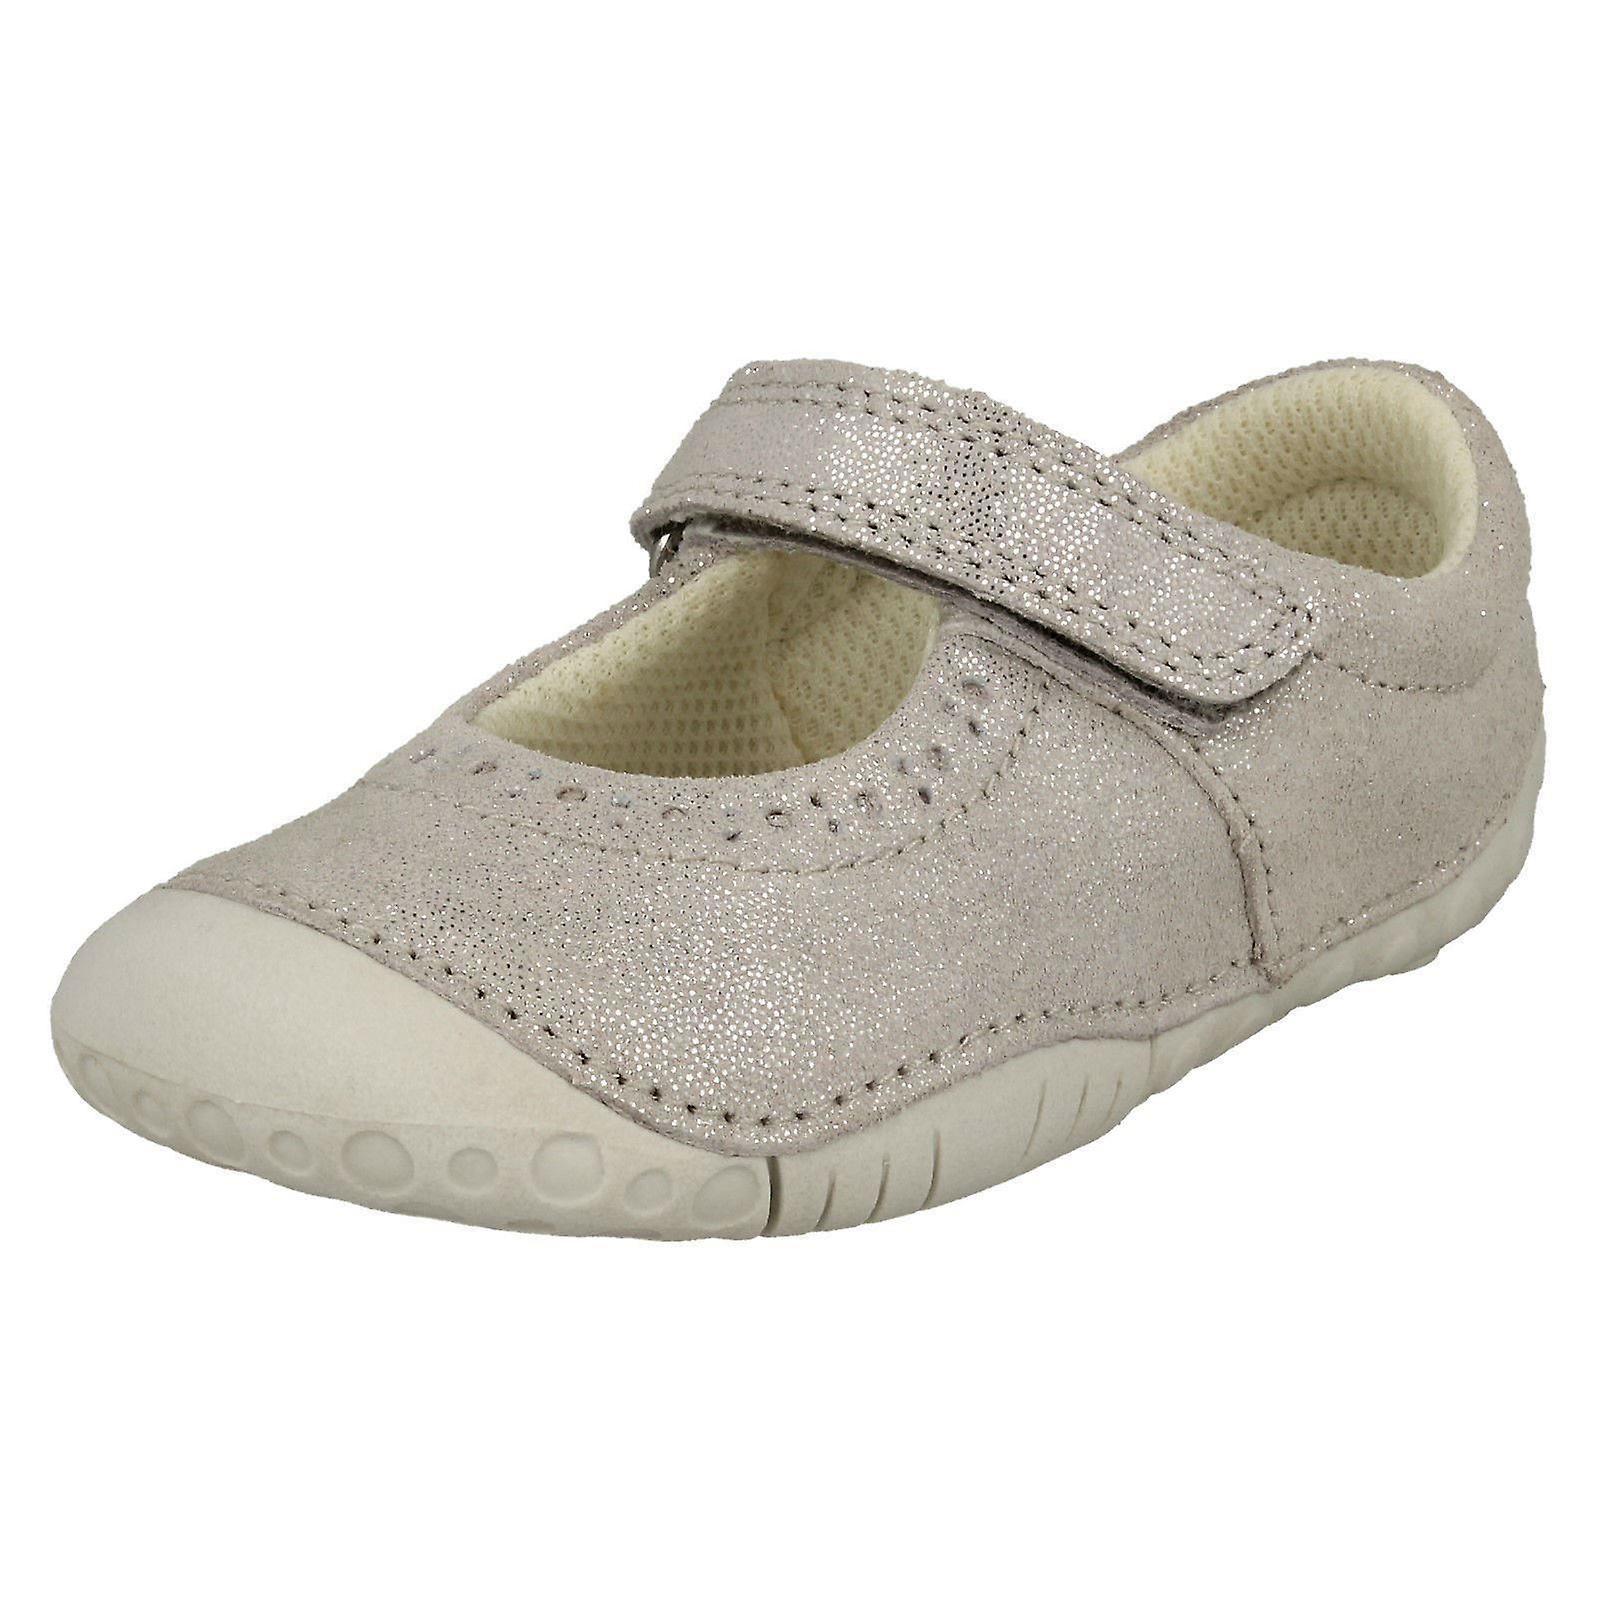 Girls Startrite Casual Shoes Cruise UK - Silver Nubuck - UK Cruise Size 4F - EU Size 20 - US Size 5 80b1e3